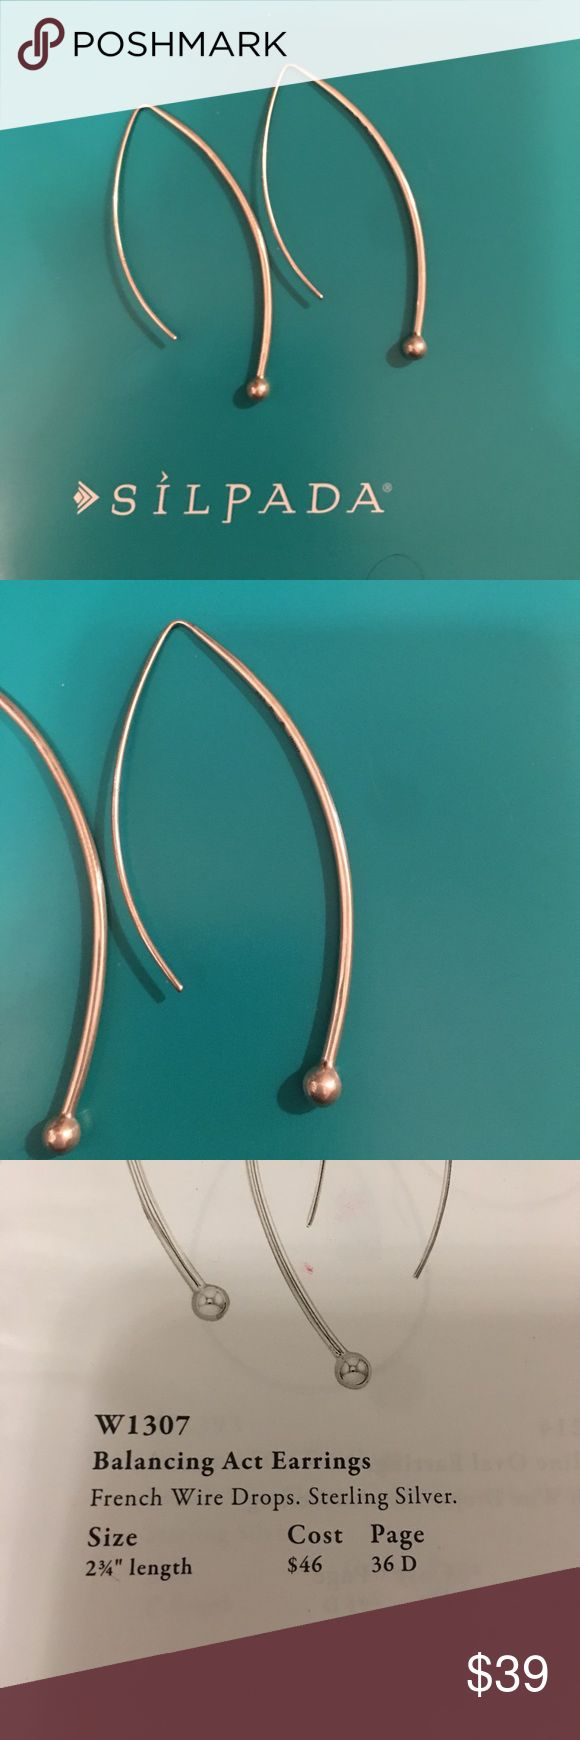 Silpada designs balancing act sterling silver Silpada designs balancing act sterling silver earrings. Silpada Jewelry Earrings